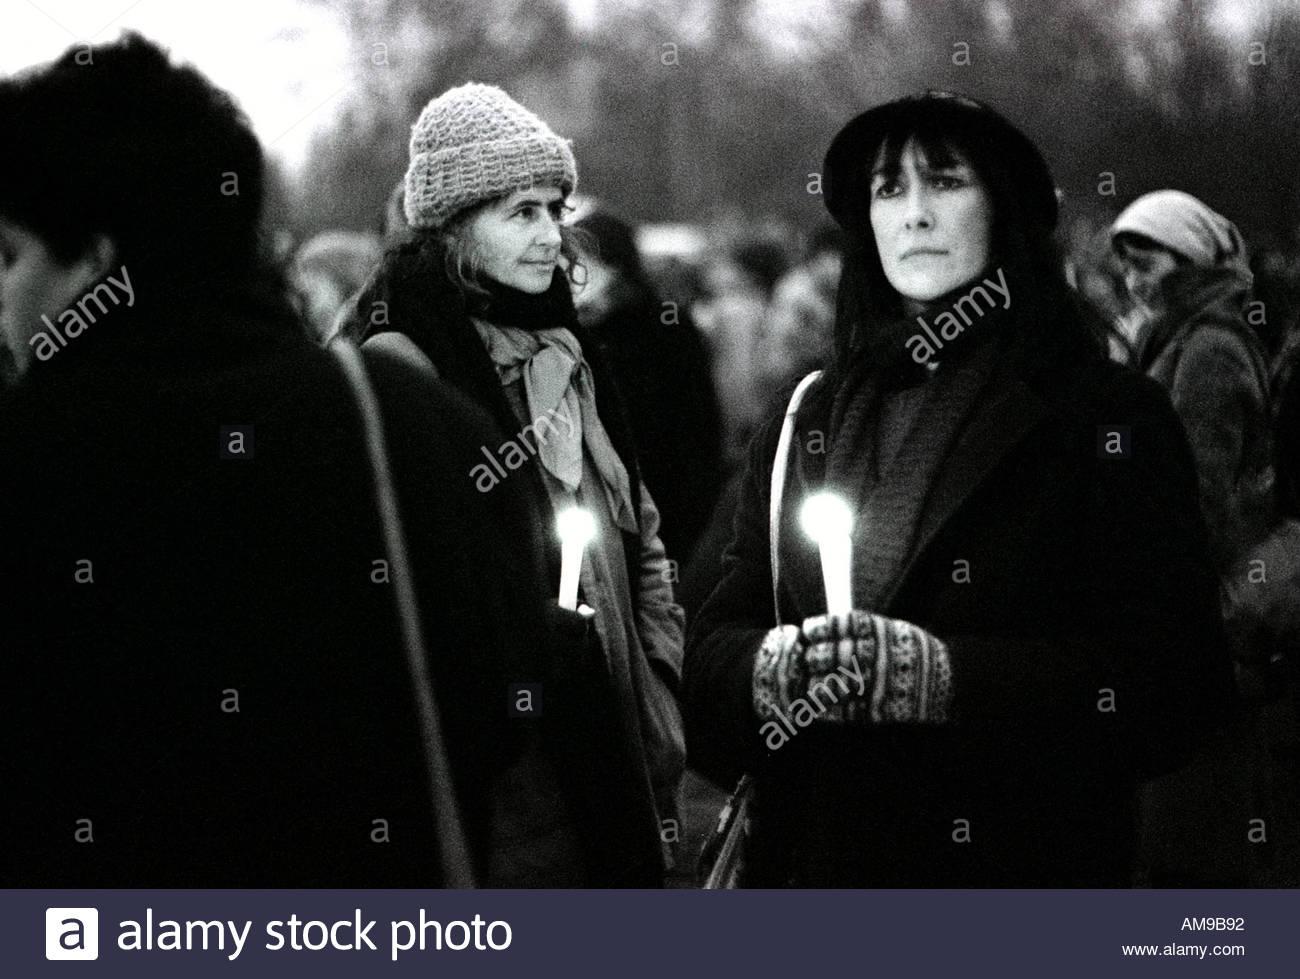 Vela encendida protesta vigilia en Greenham Common base aérea estadounidense en Berkshire 1984. Imagen De Stock